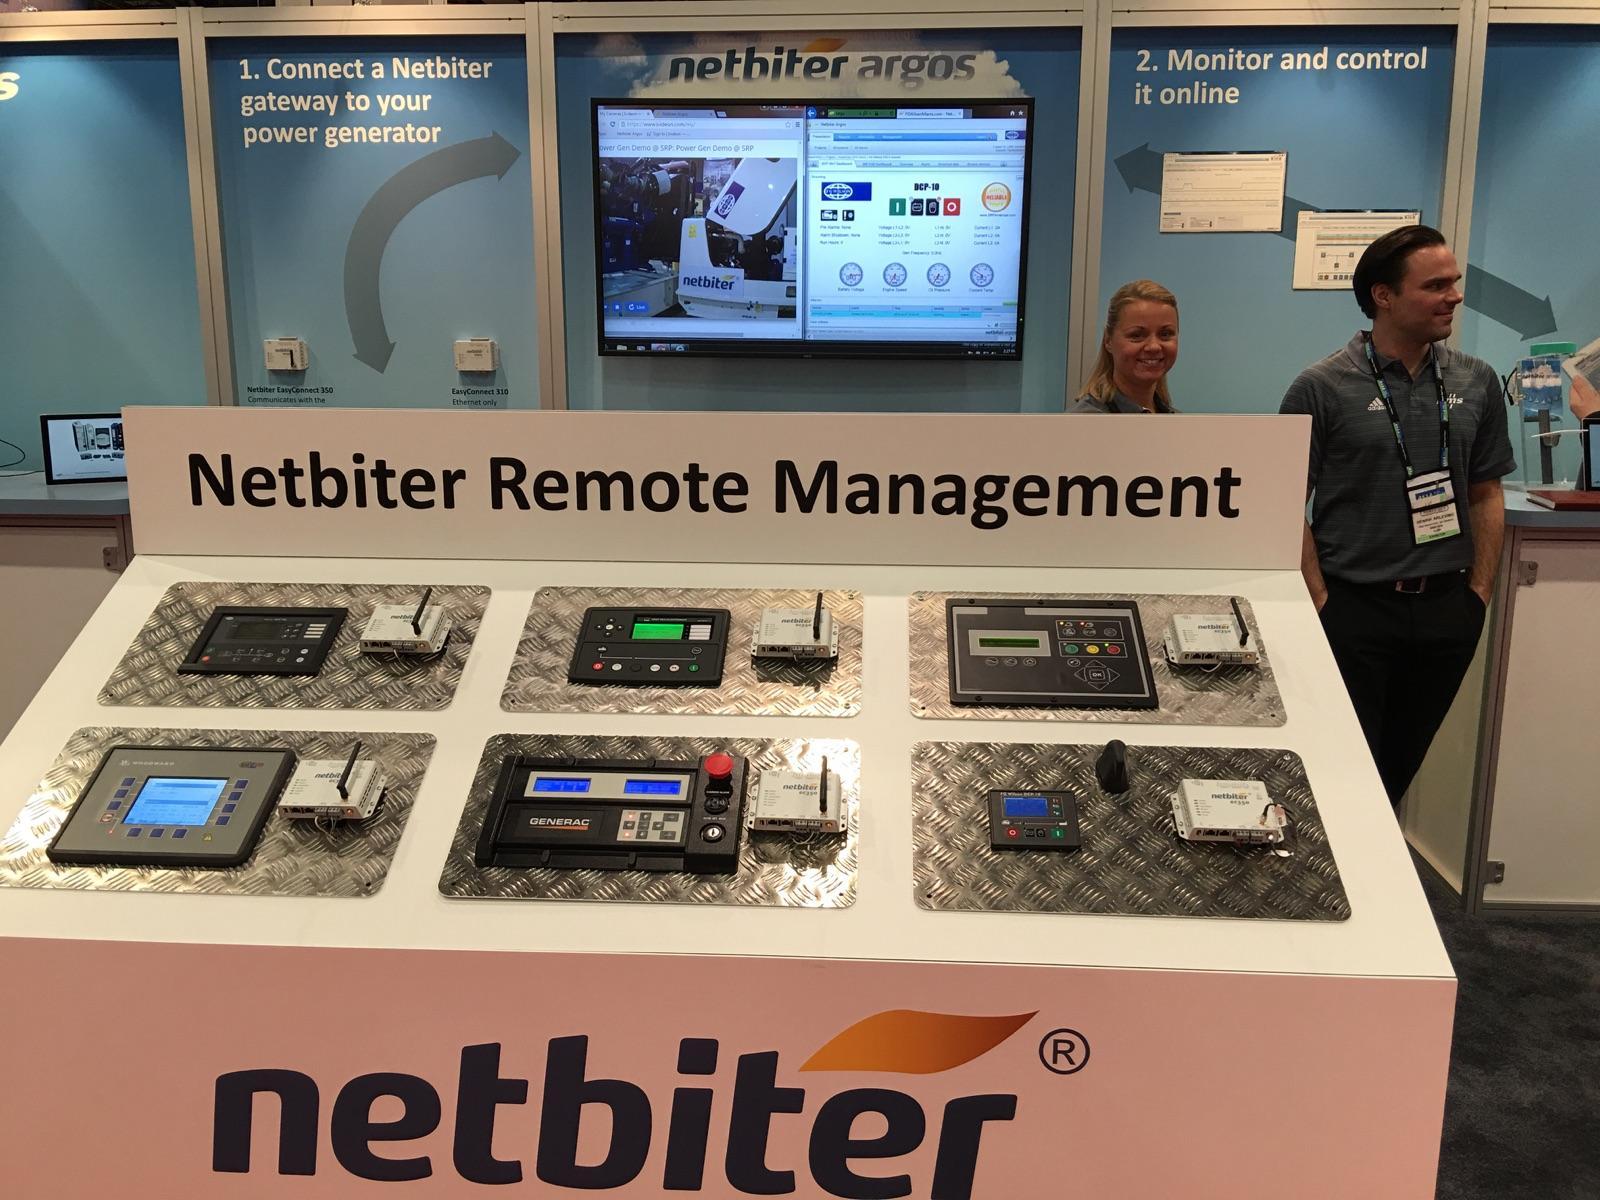 Netbiter Remote Managment